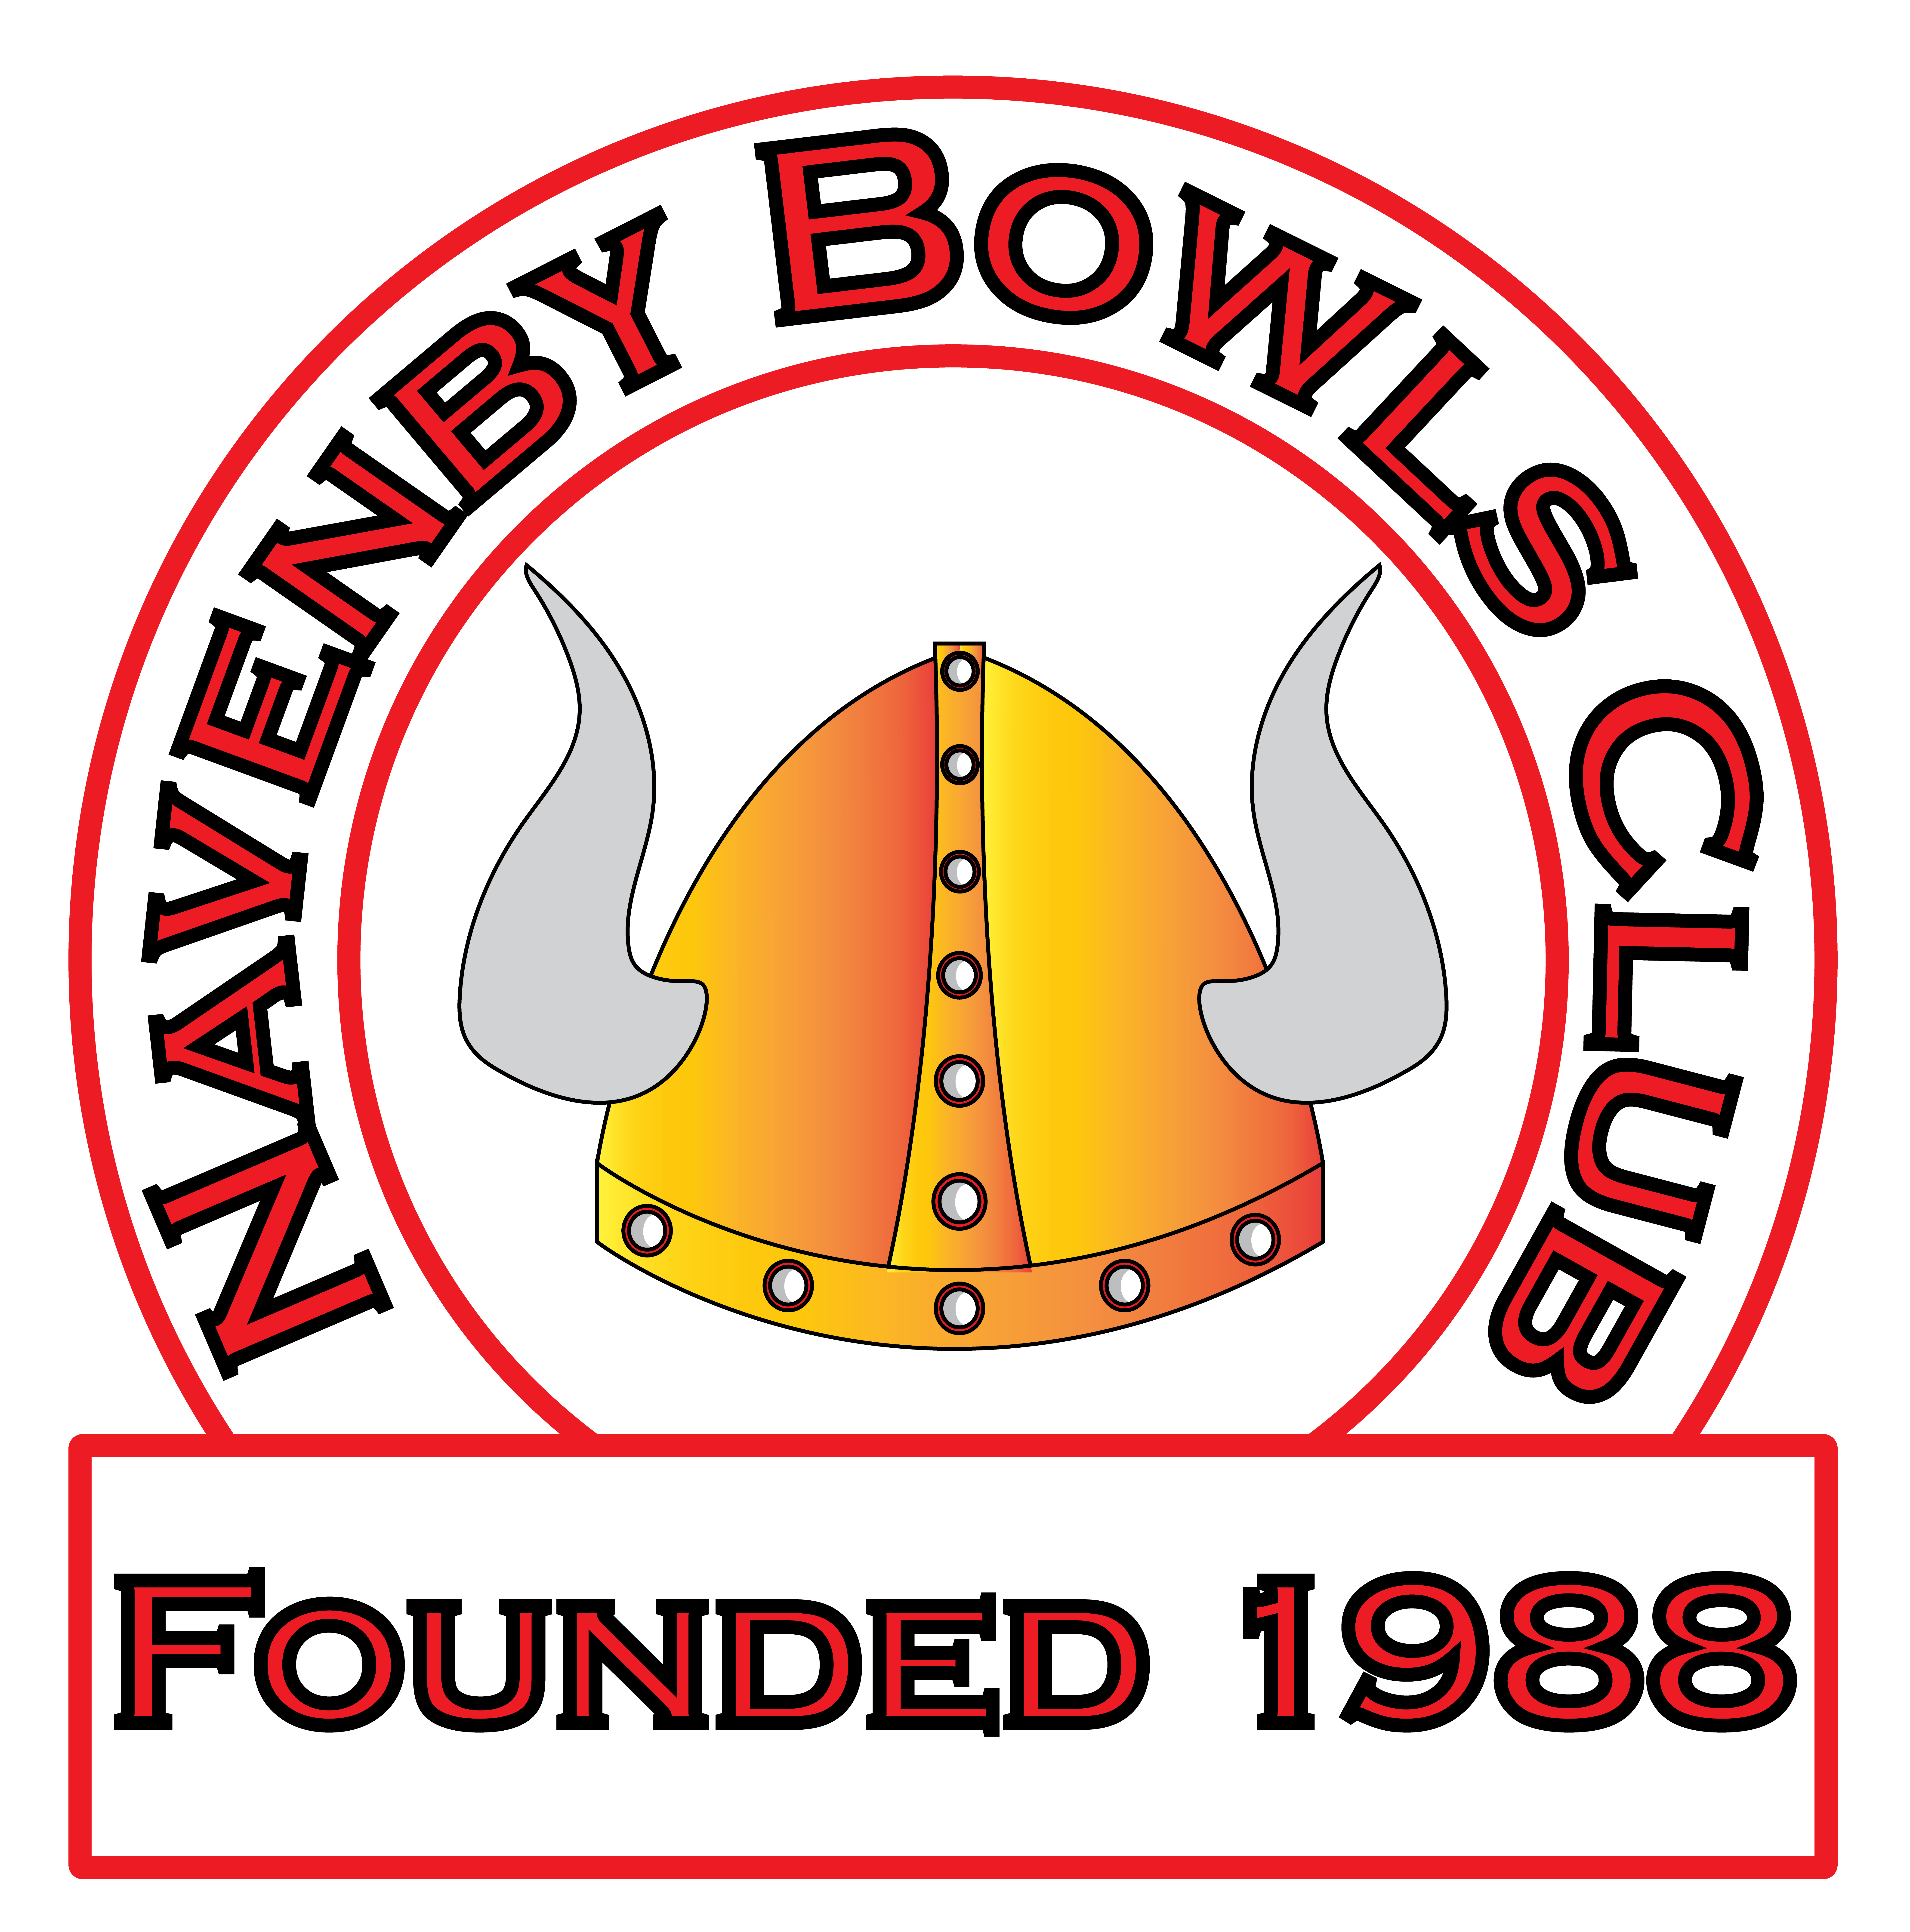 Navenby Bowls Club